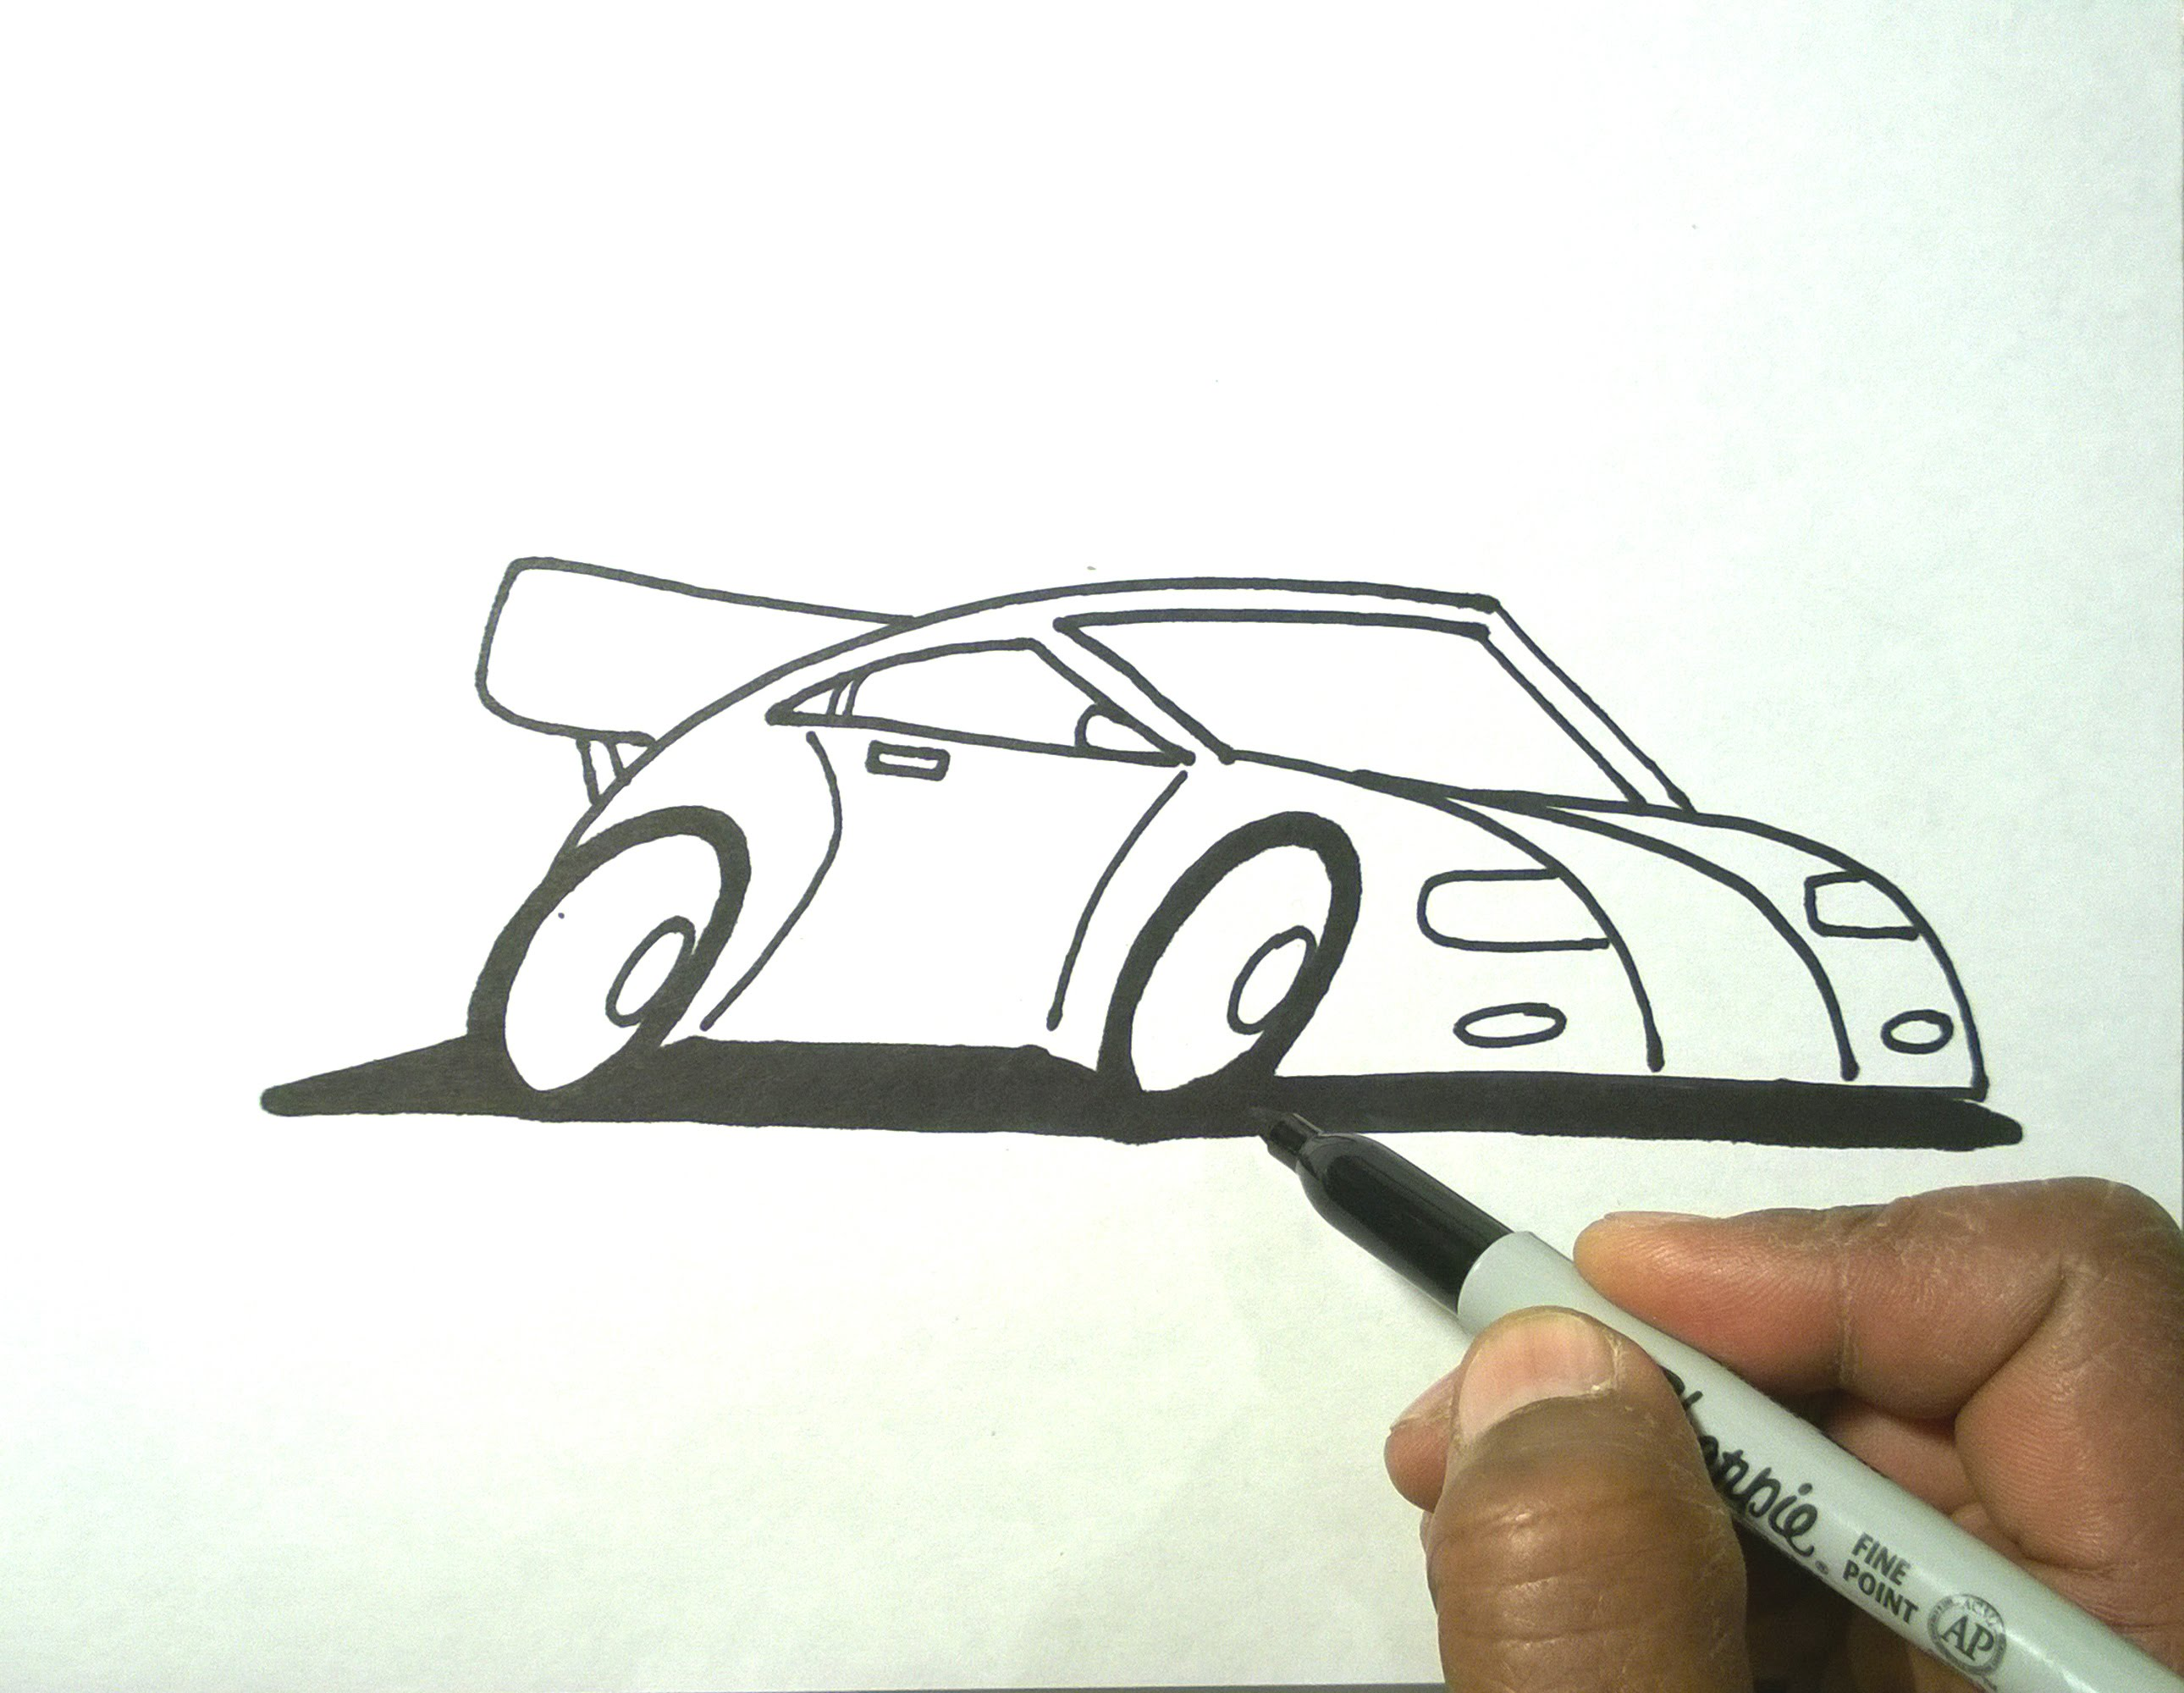 Drawn cartoon sharpie #9